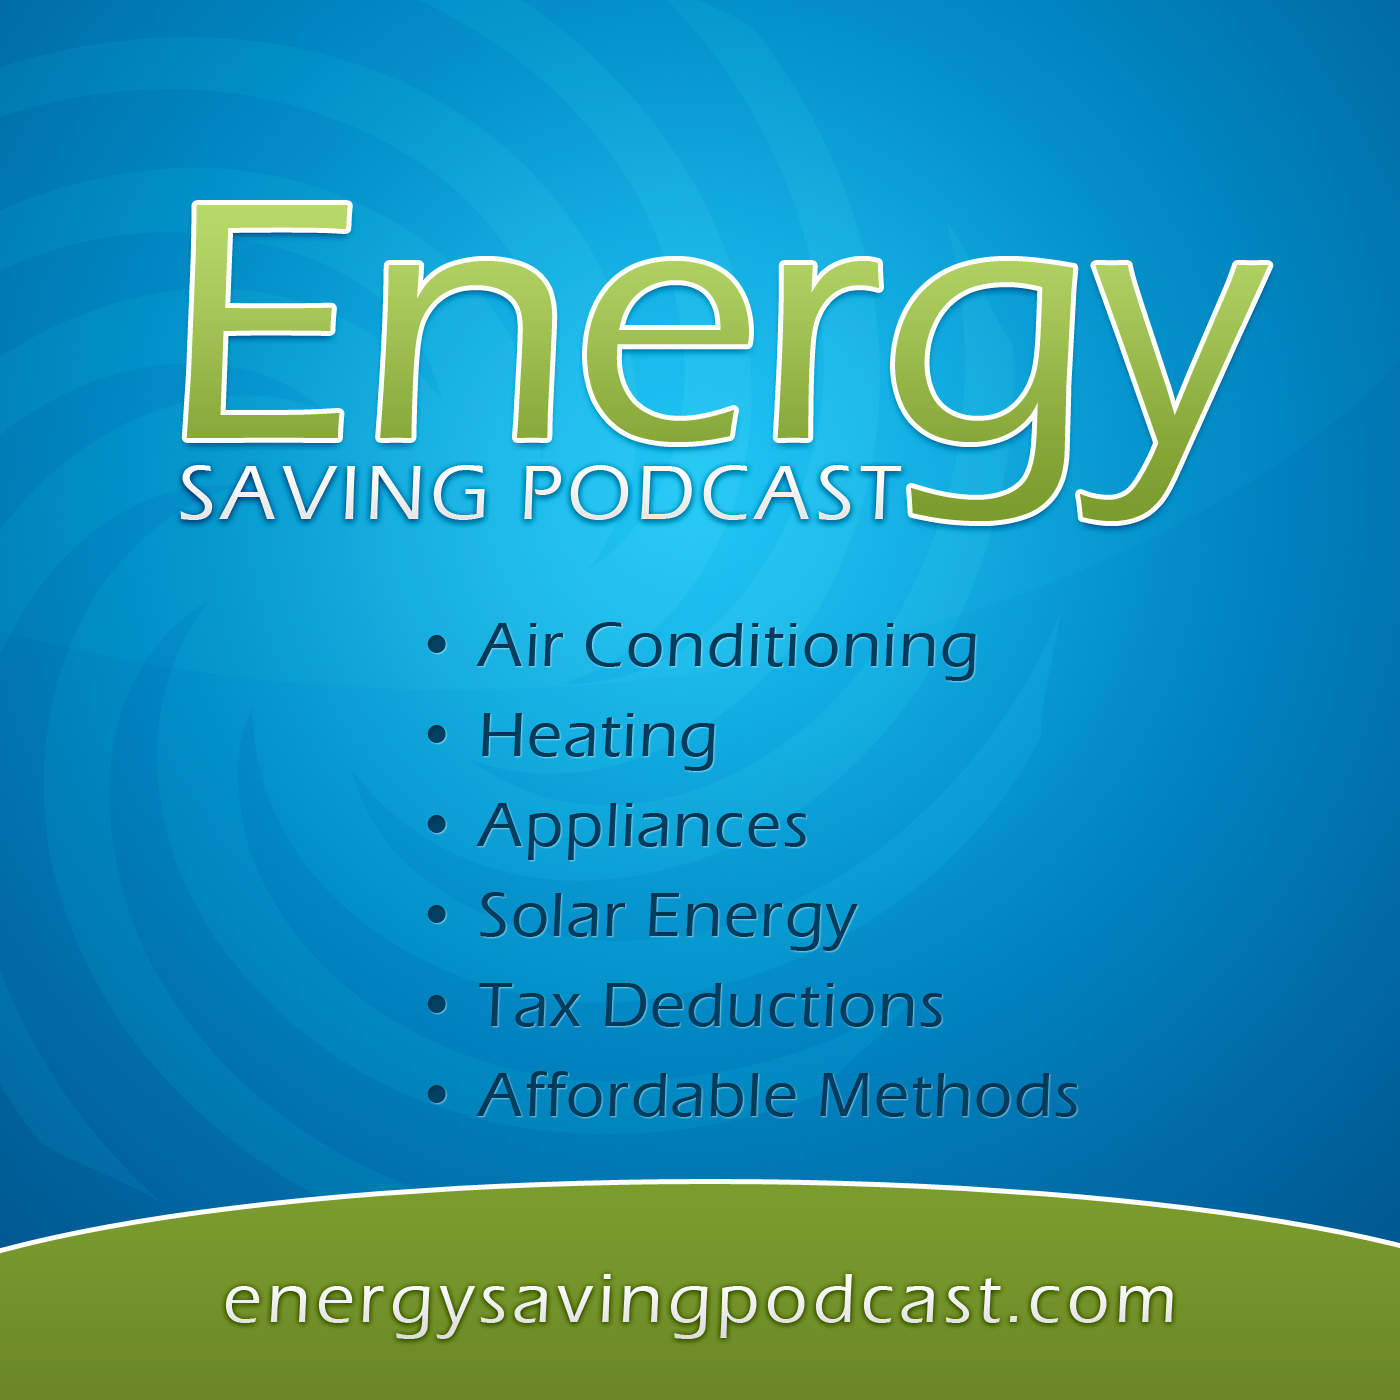 EnergySavingPodcast